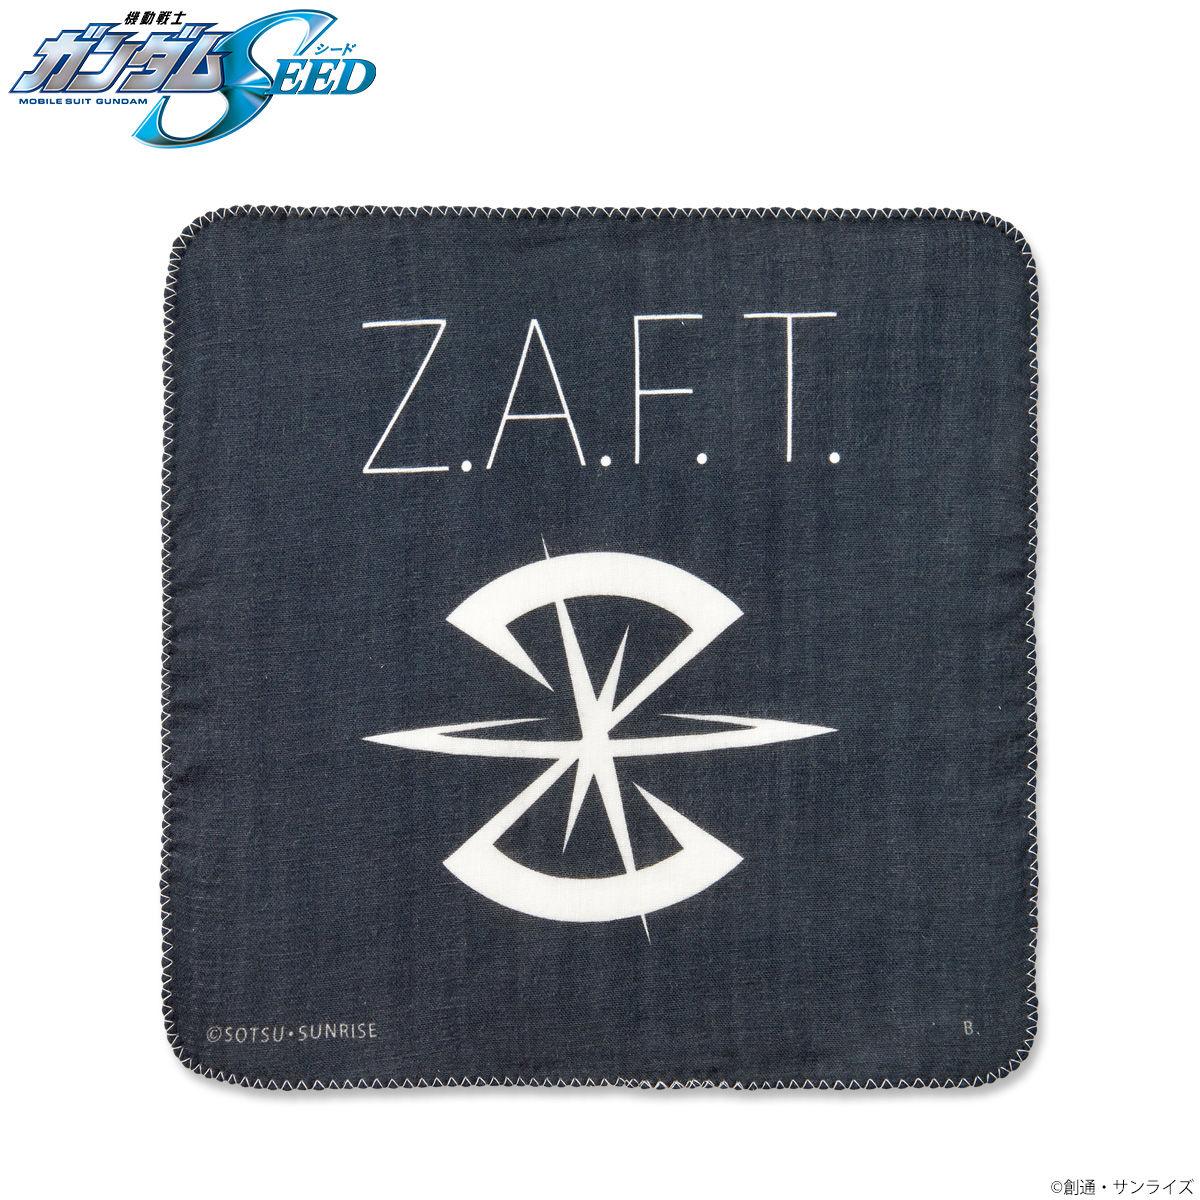 Mobile Suit Gundam SEED ZAFT Emblem Handkerchief